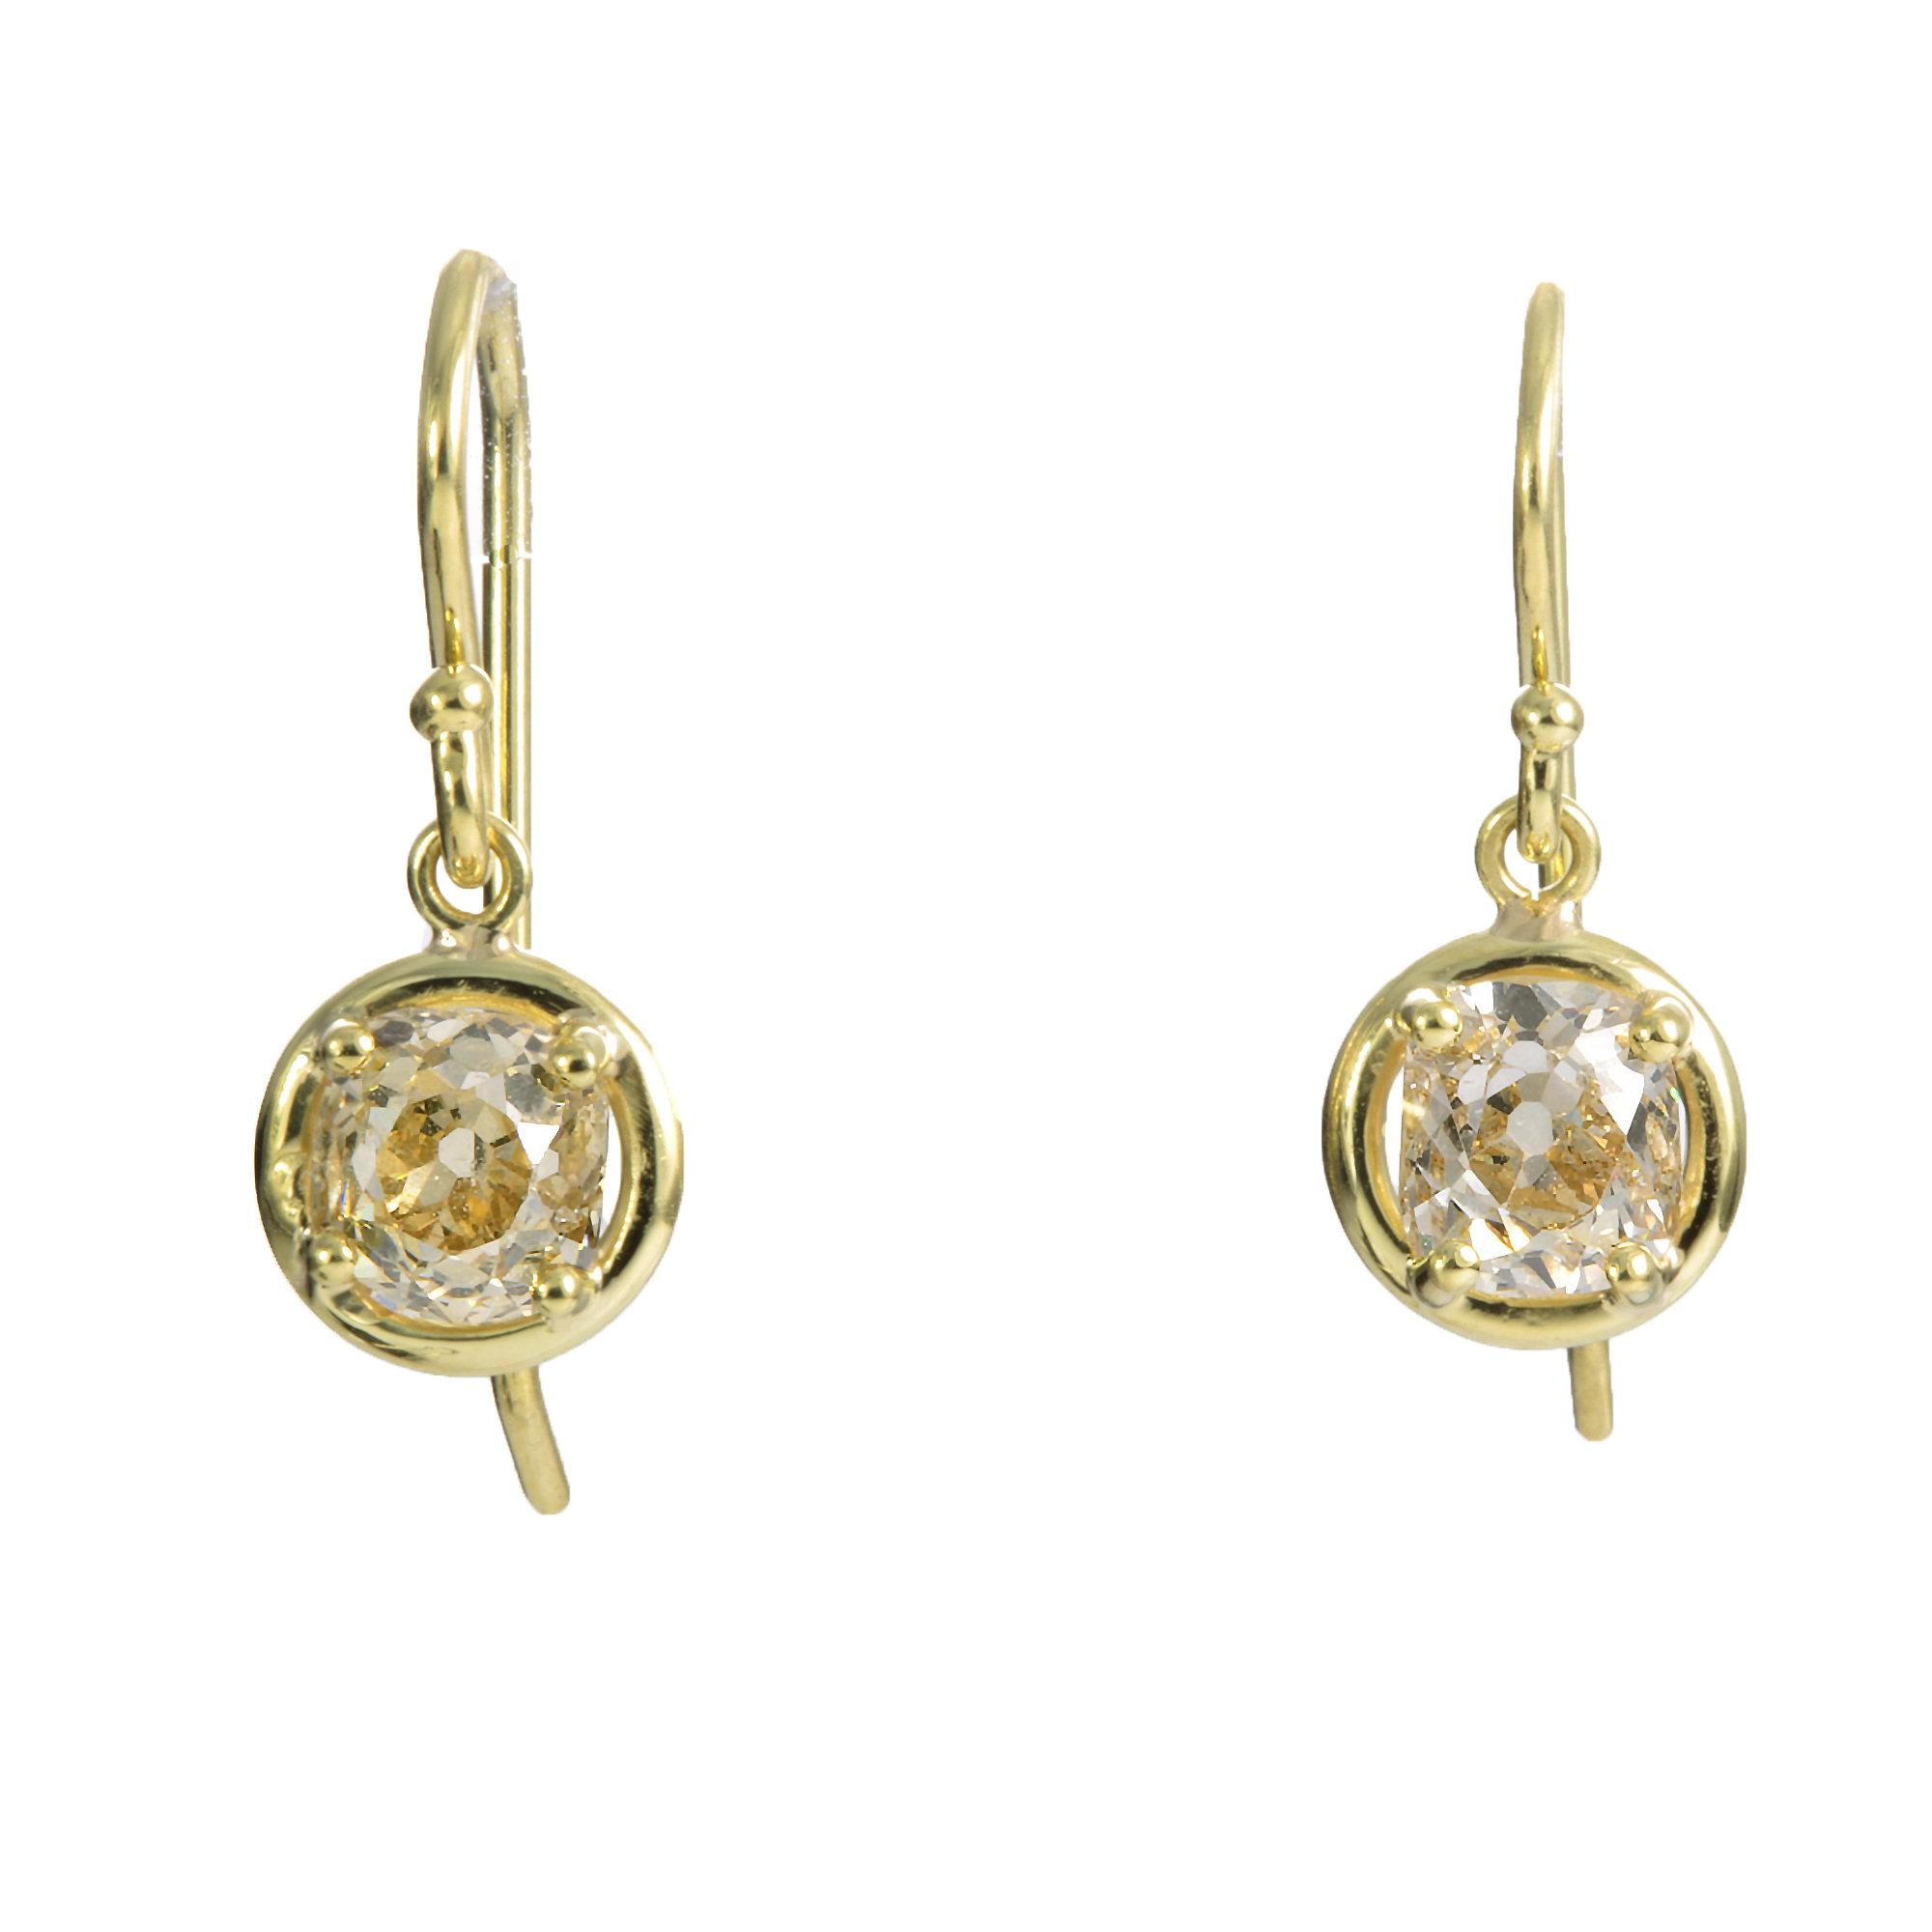 David J Thomas Jewelry